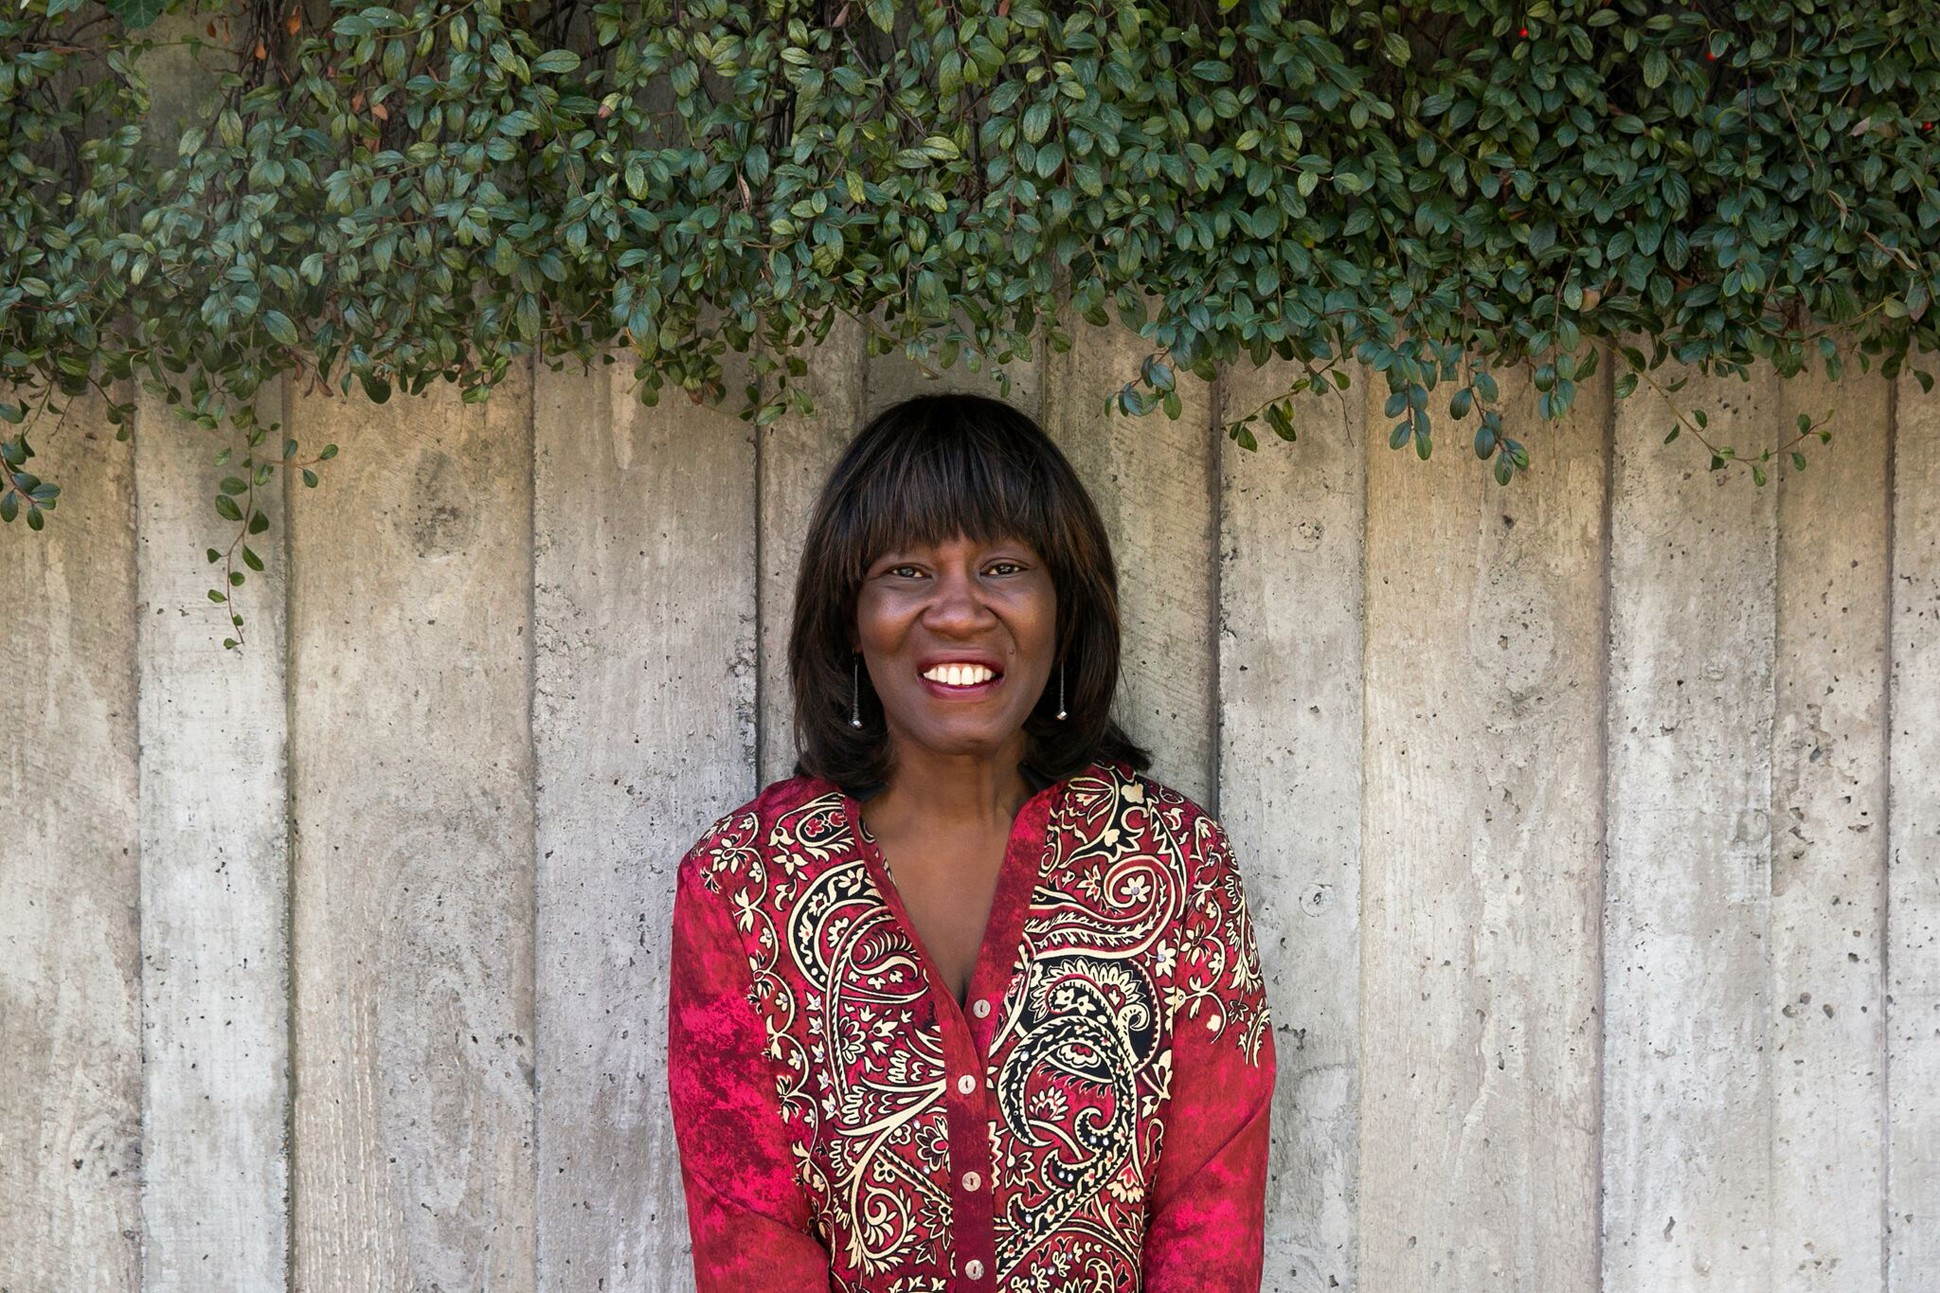 Image of Patricia Smith.